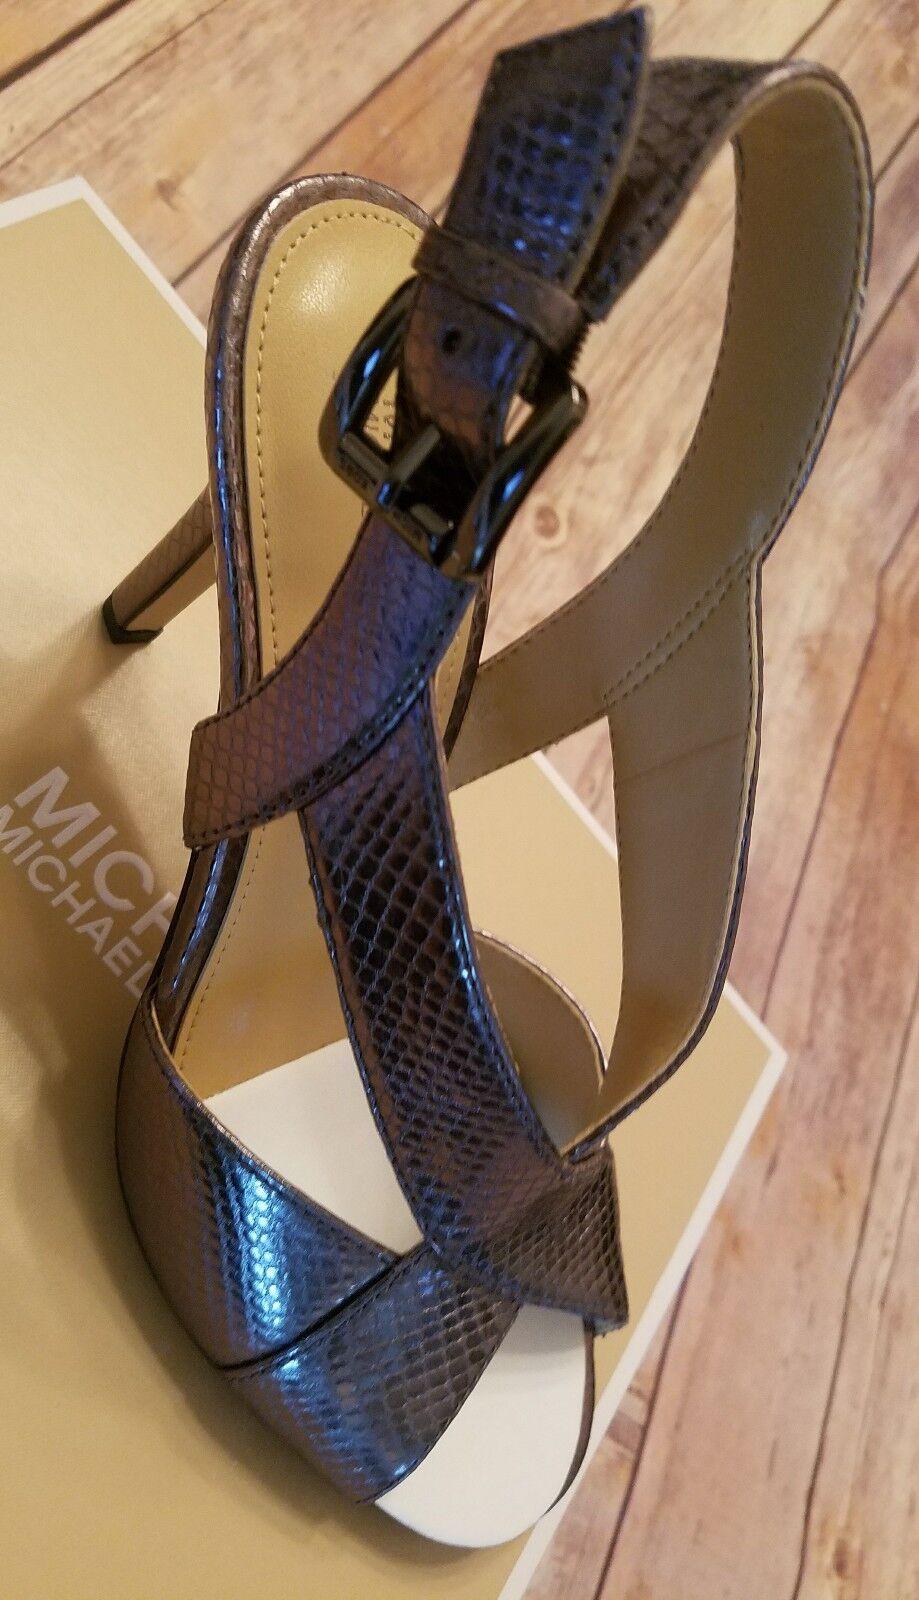 Vionic with Orthaheel Paulie Women's Sandal Tan Tan Sandal 8 M US 08469b